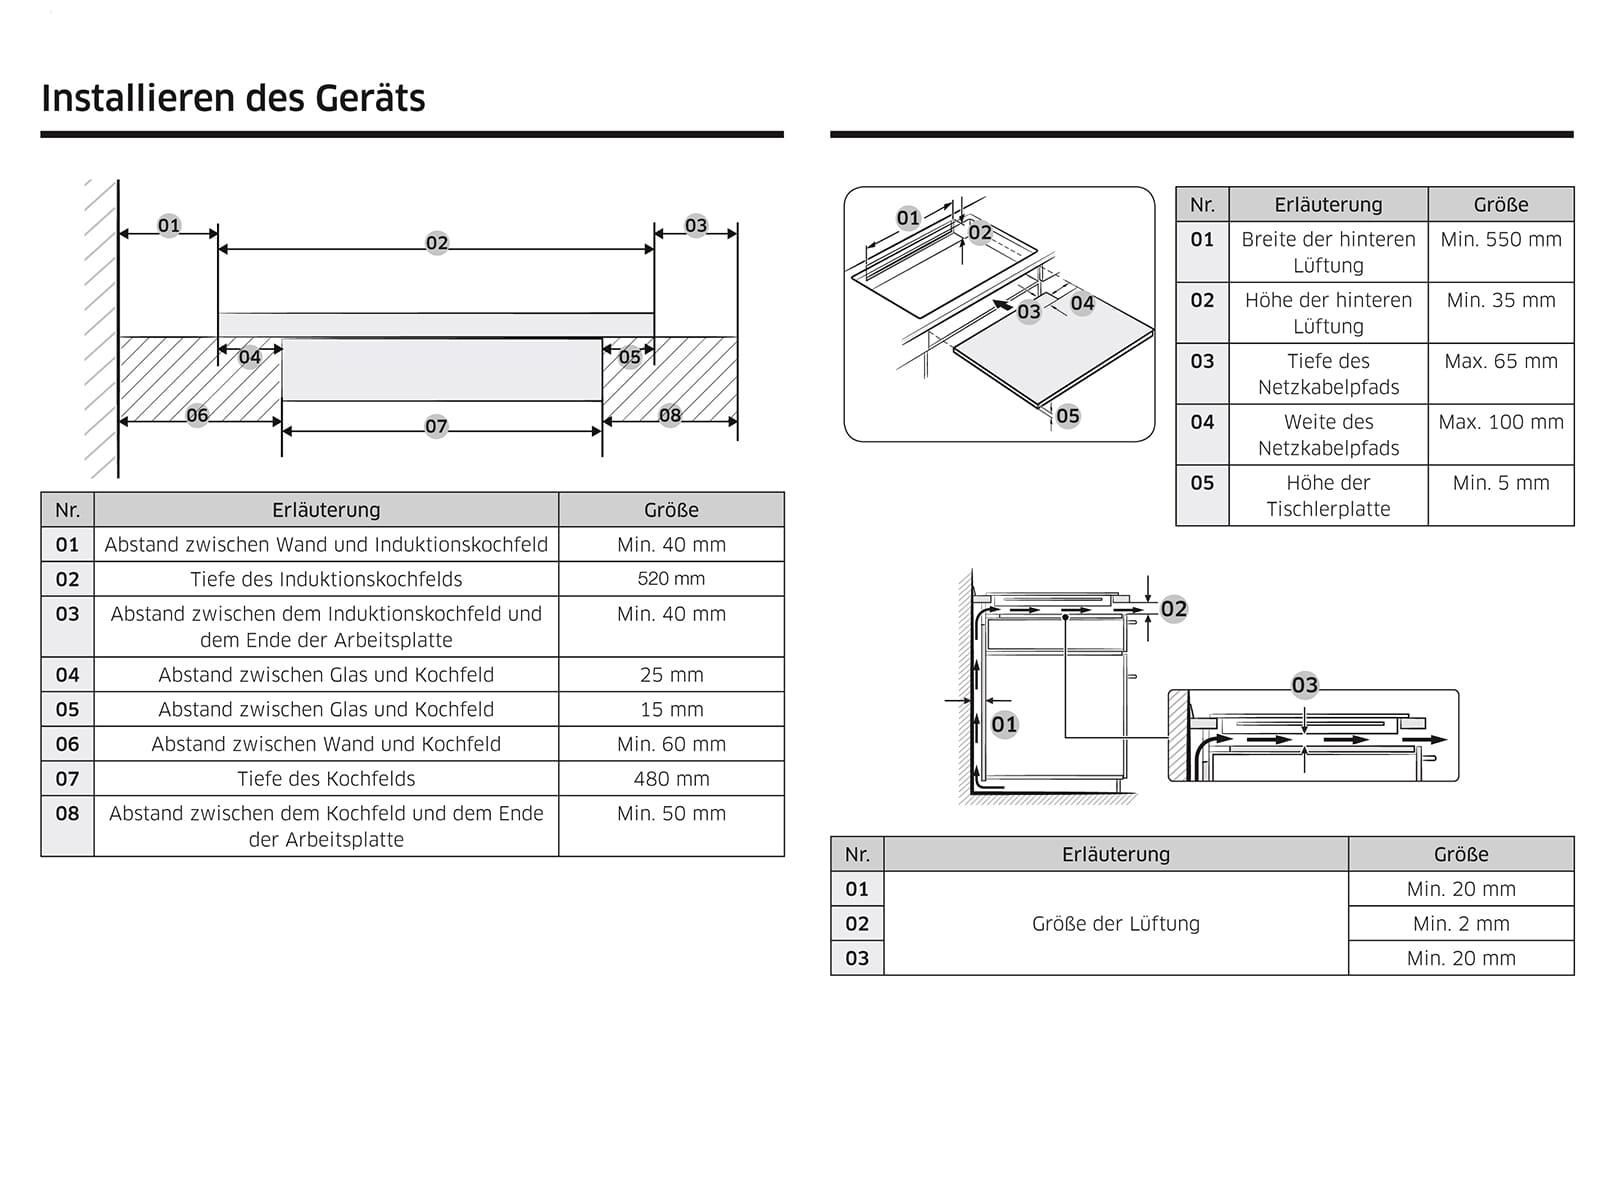 Samsung NZ64K7757BK/EG Induktionskochfeld autark